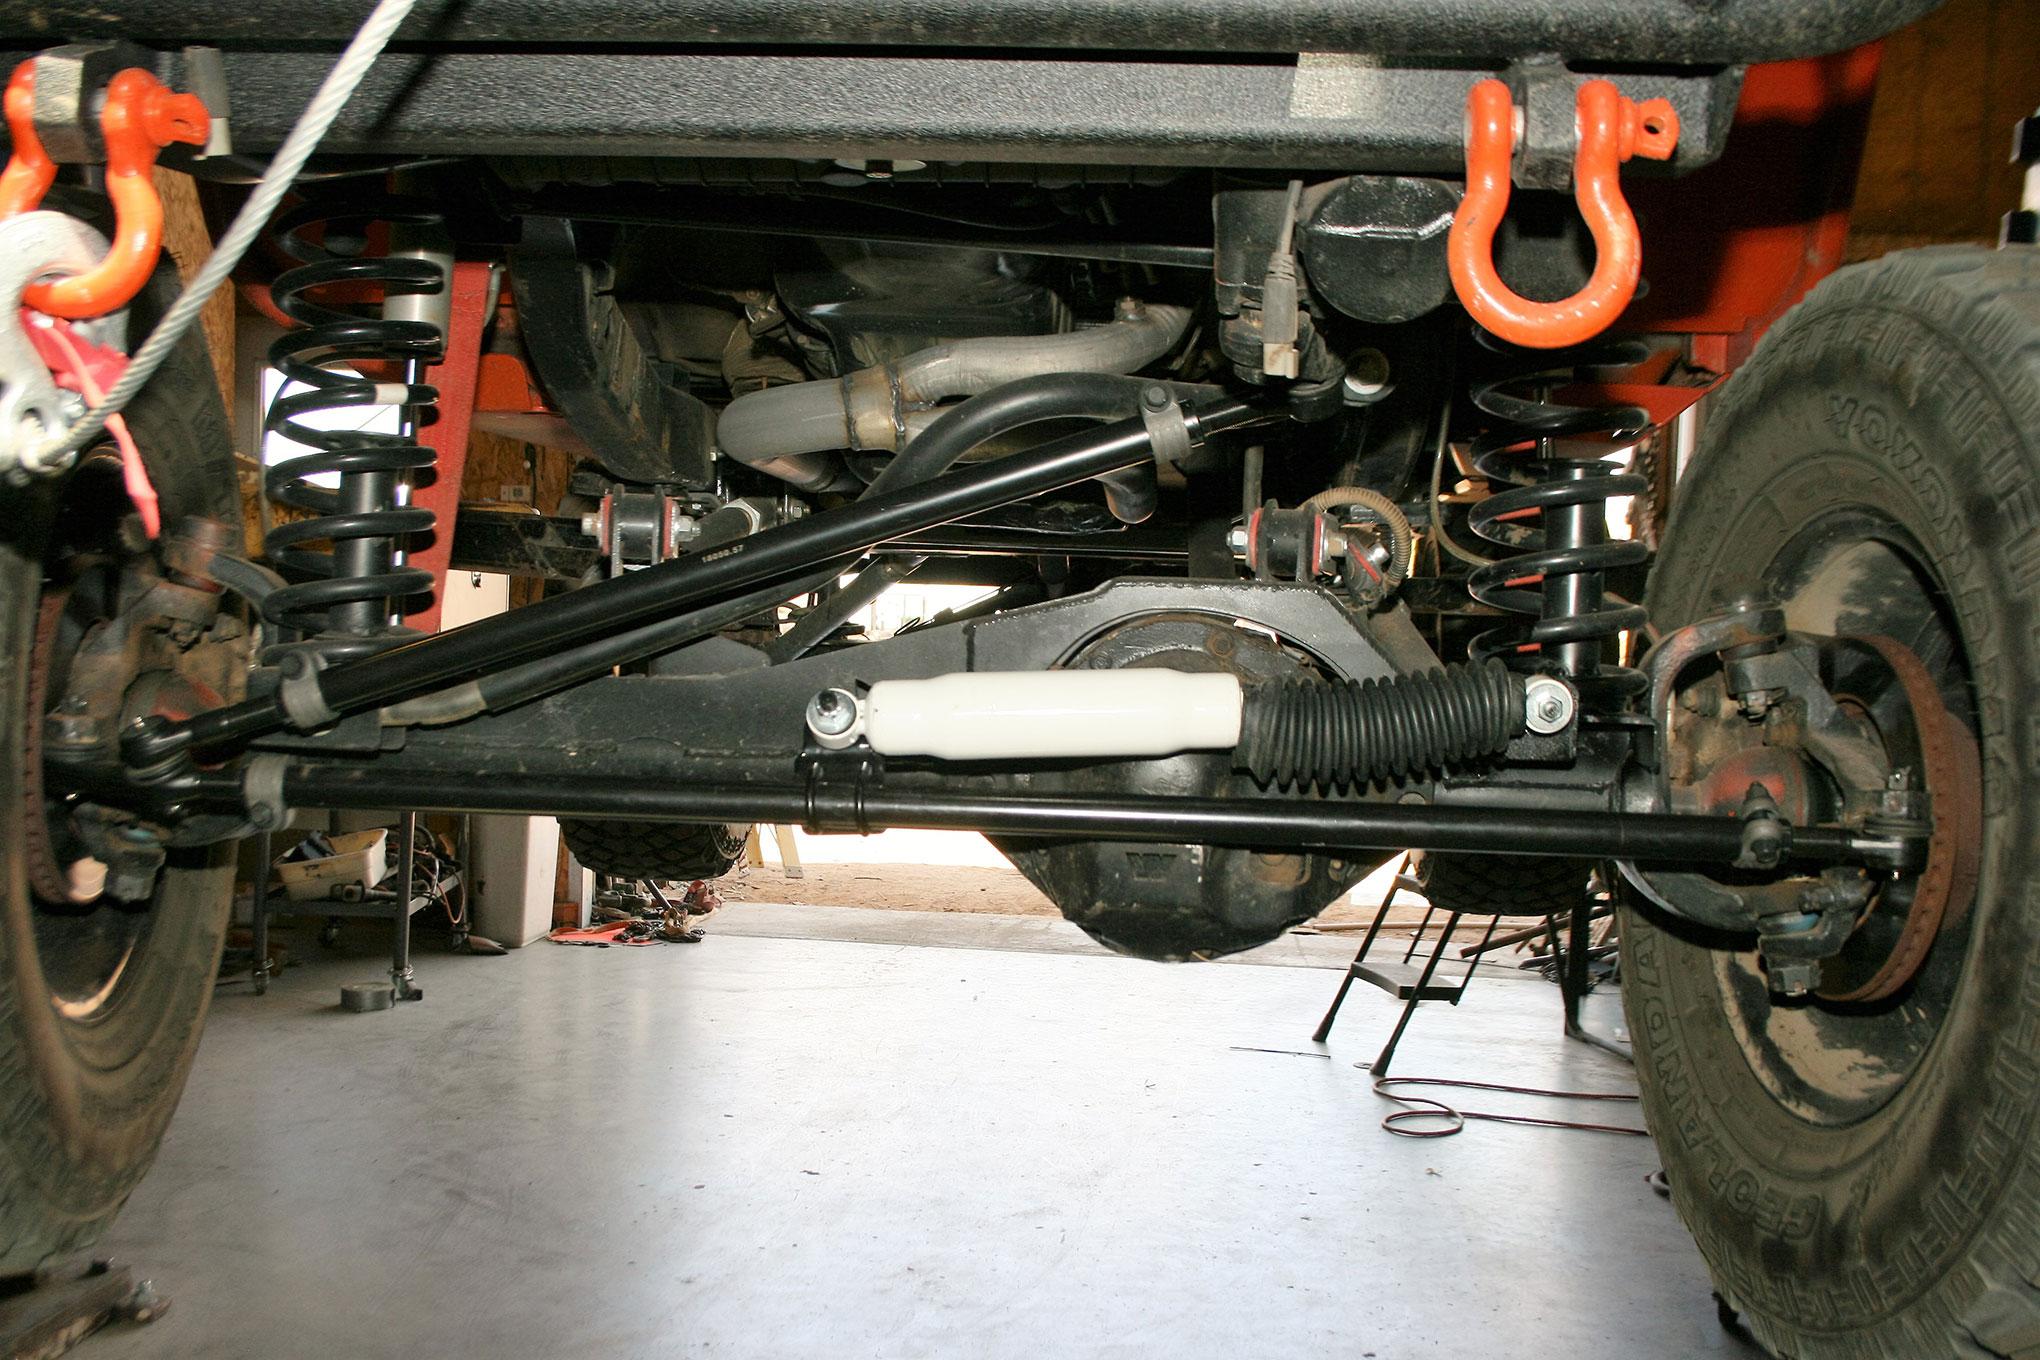 088 2005 rubicon suspension heavy dty stabilizer rugged ridge